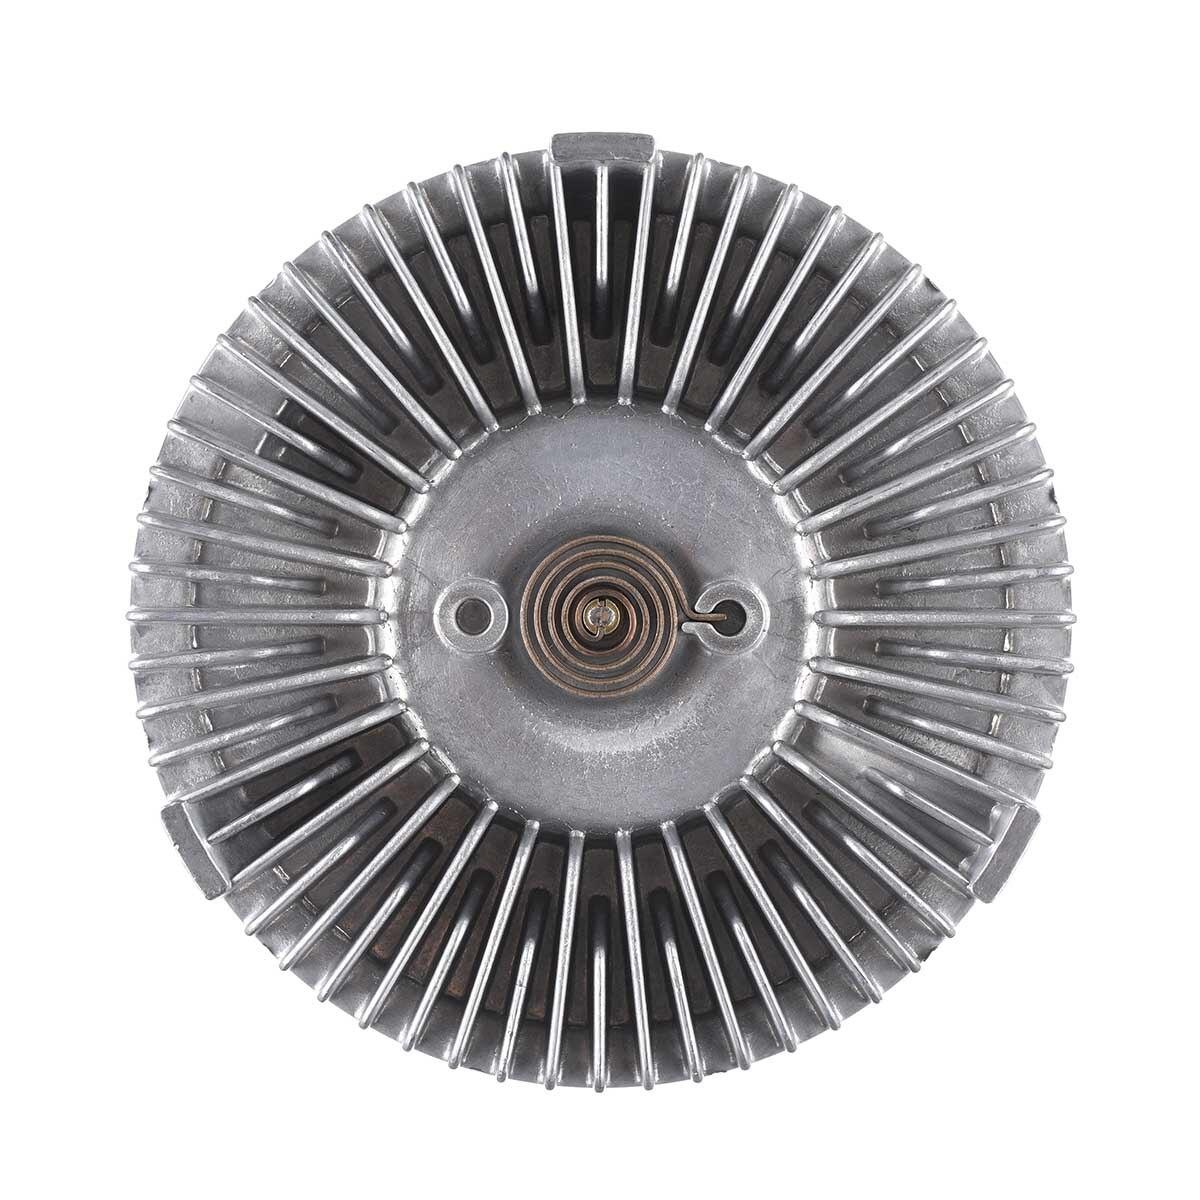 A-Premium Engine Cooling Fan Clutch for Ford Ranger 1998-2011 Explorer 1998-2001 Explorer Sport Trac Mazda B4000 Mercury Mountaineer 4.0L PremiumpartsWhosale